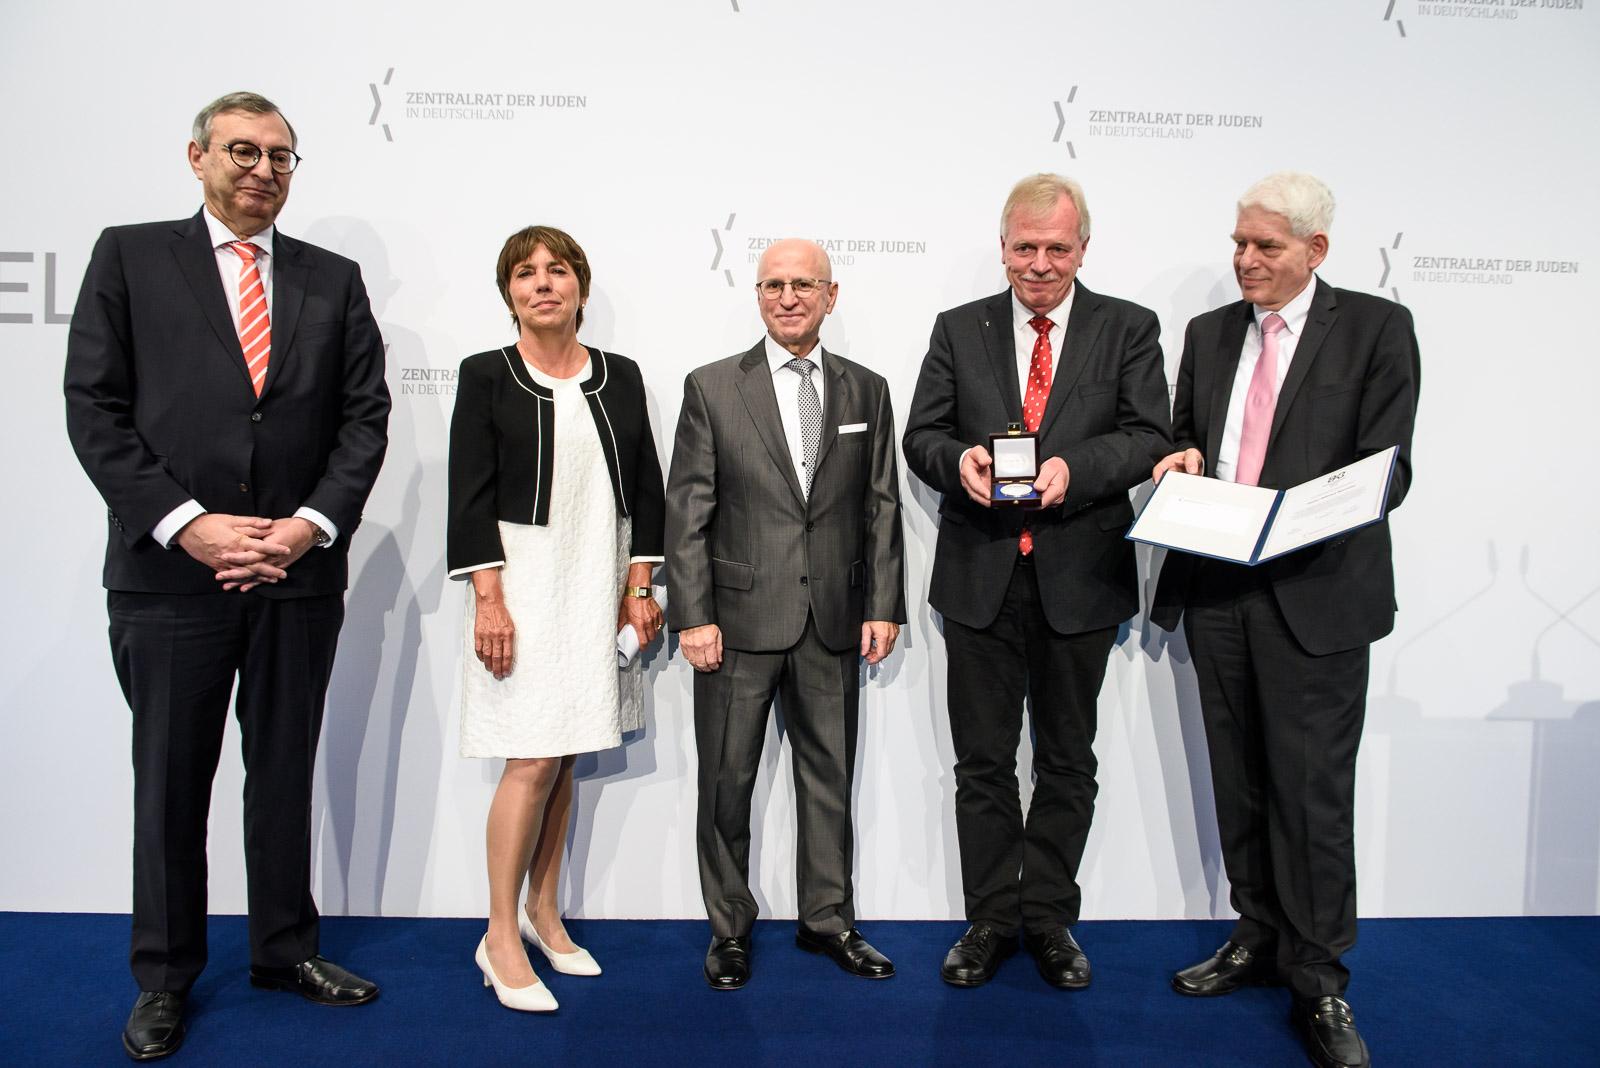 v.L. Abraham Lehrer, Prof. Dr. Margot Kässmann, Mark Dainow, Wilfried Manneke, Dr. Josef Schuster